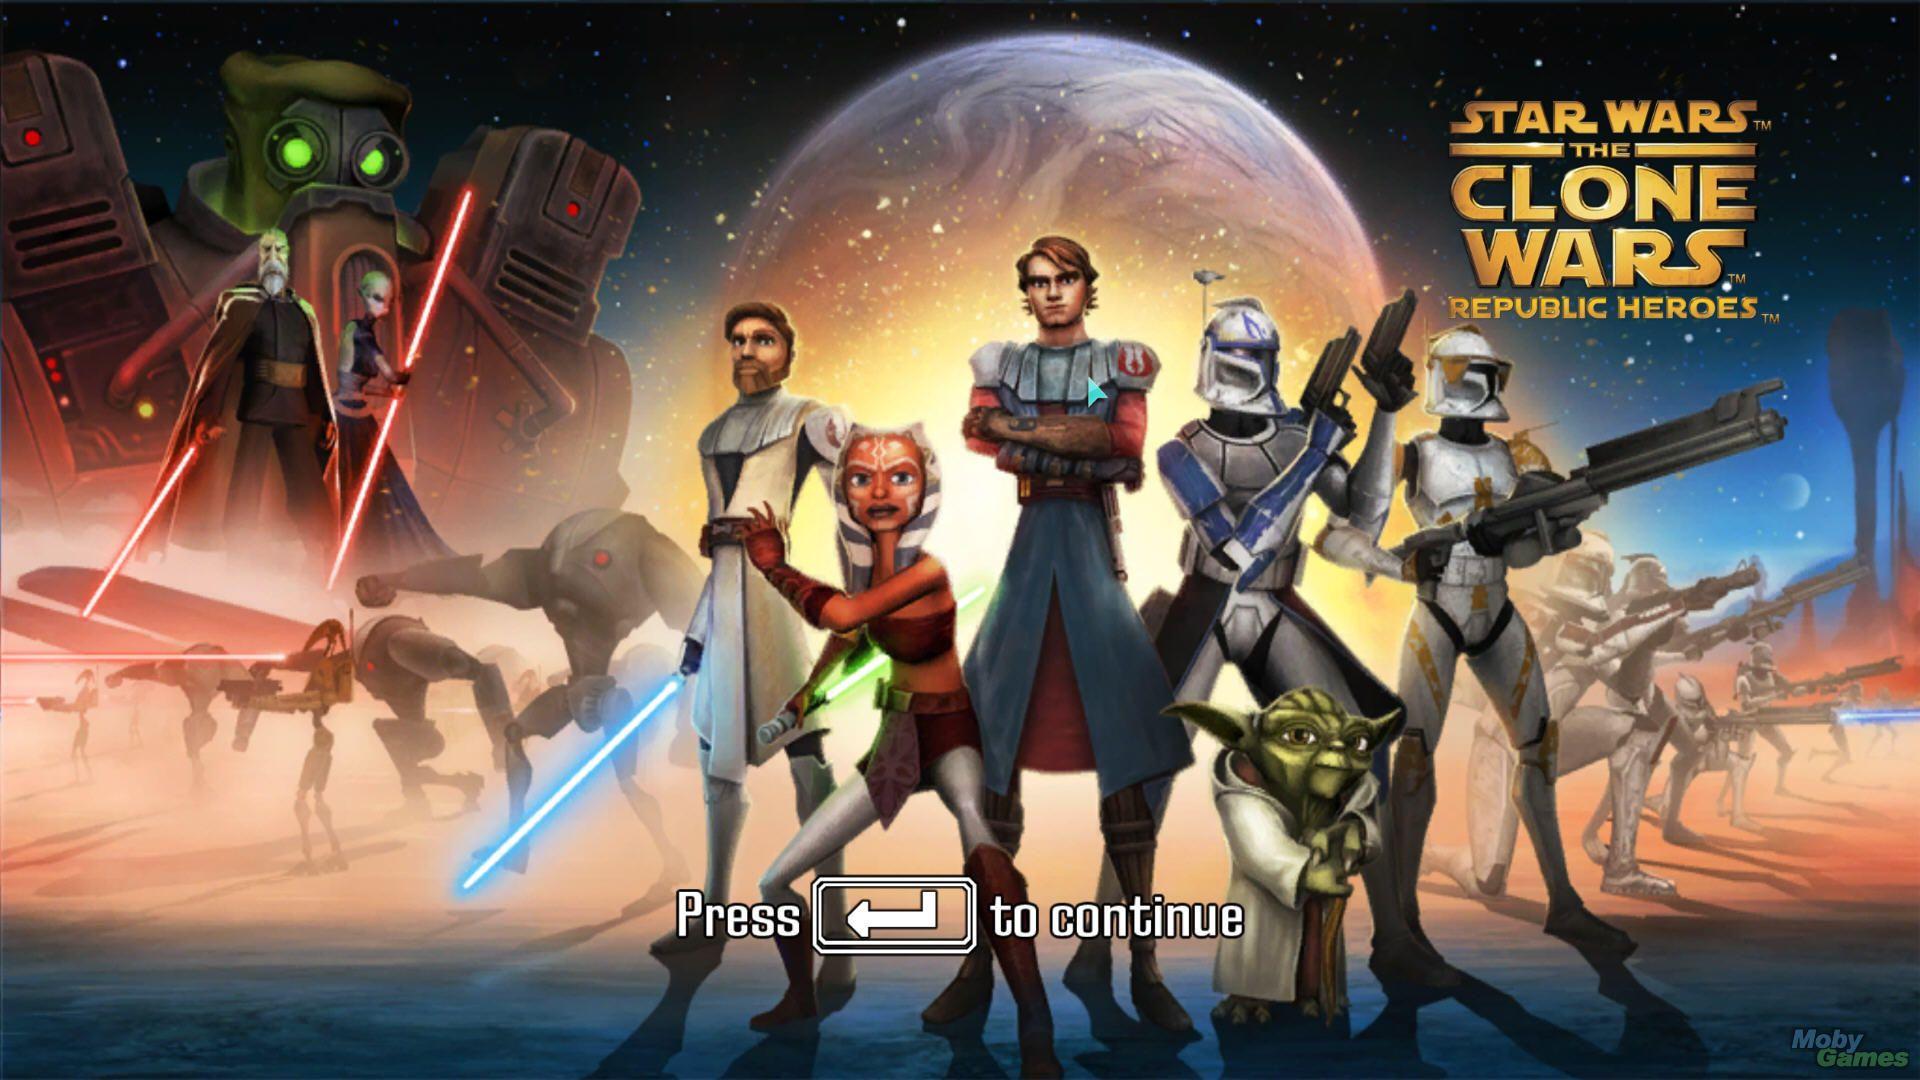 Star Wars The Clone Wars Desktop 1920x1080 Download Hd Wallpaper Wallpapertip